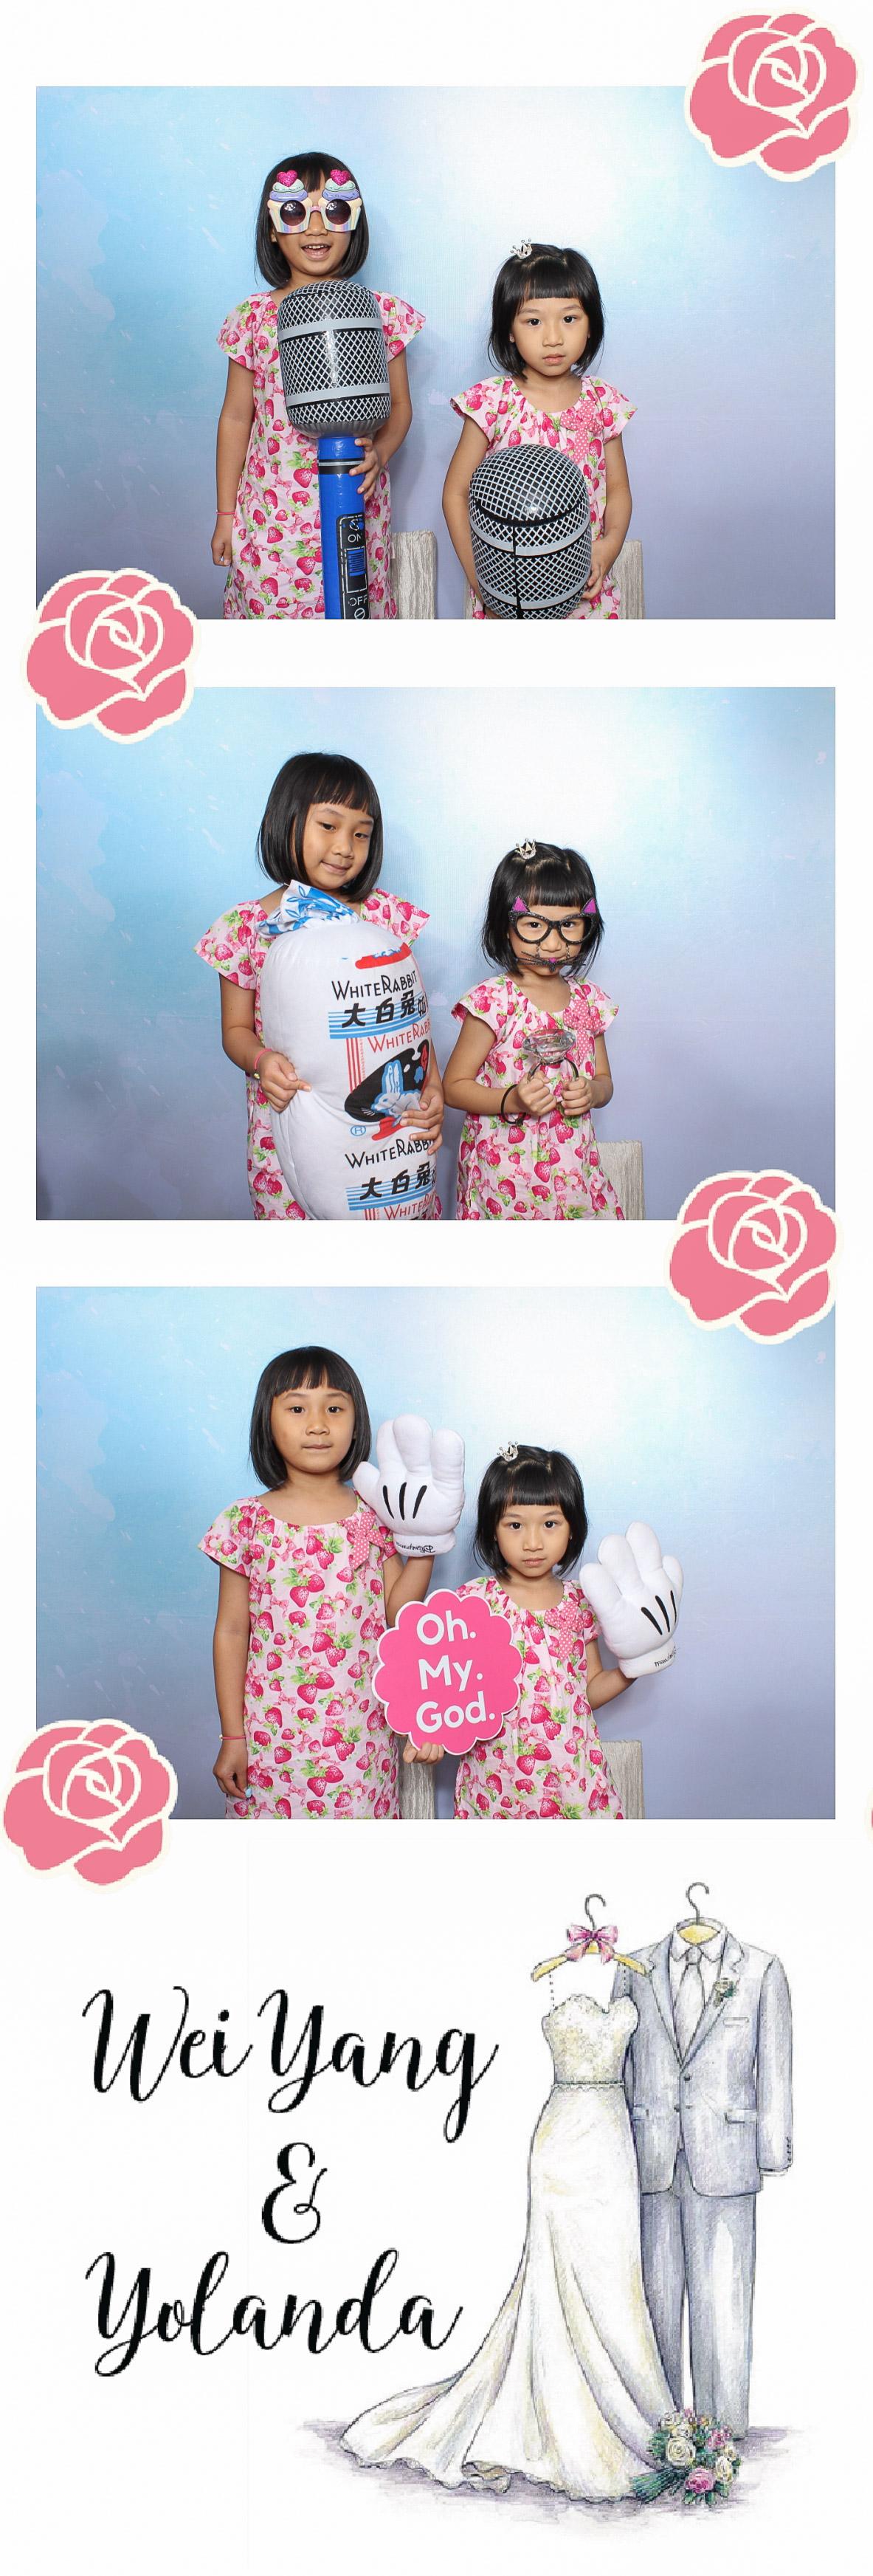 Photobooth 1706-33